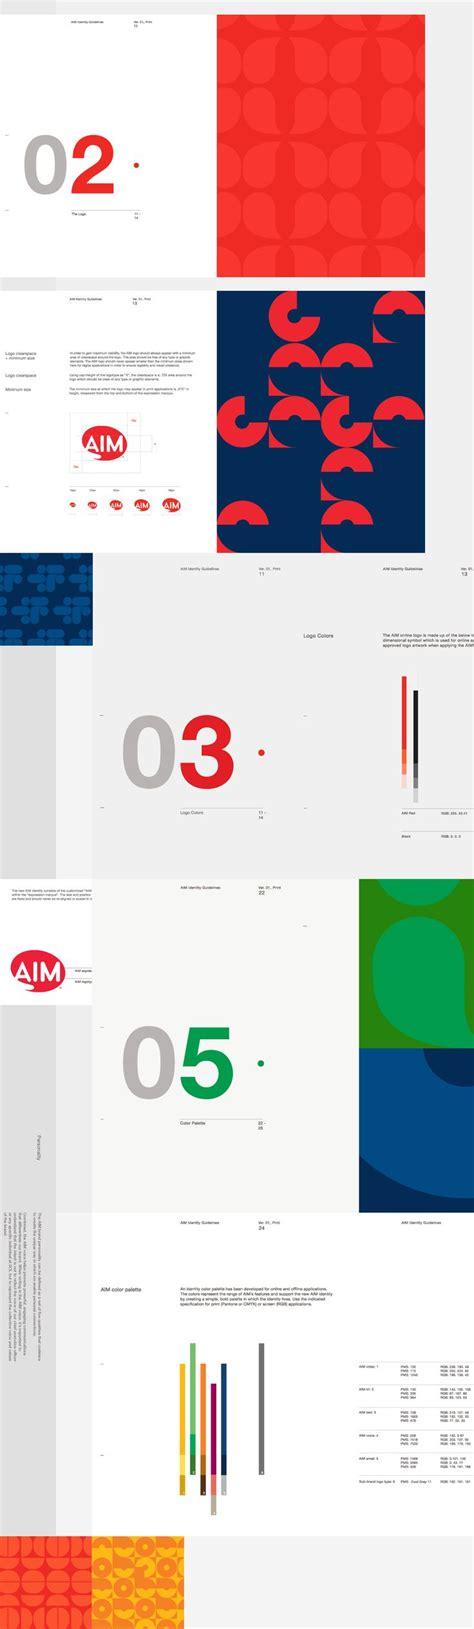 design pattern guidelines 172 best guidelines editorial design images on pinterest